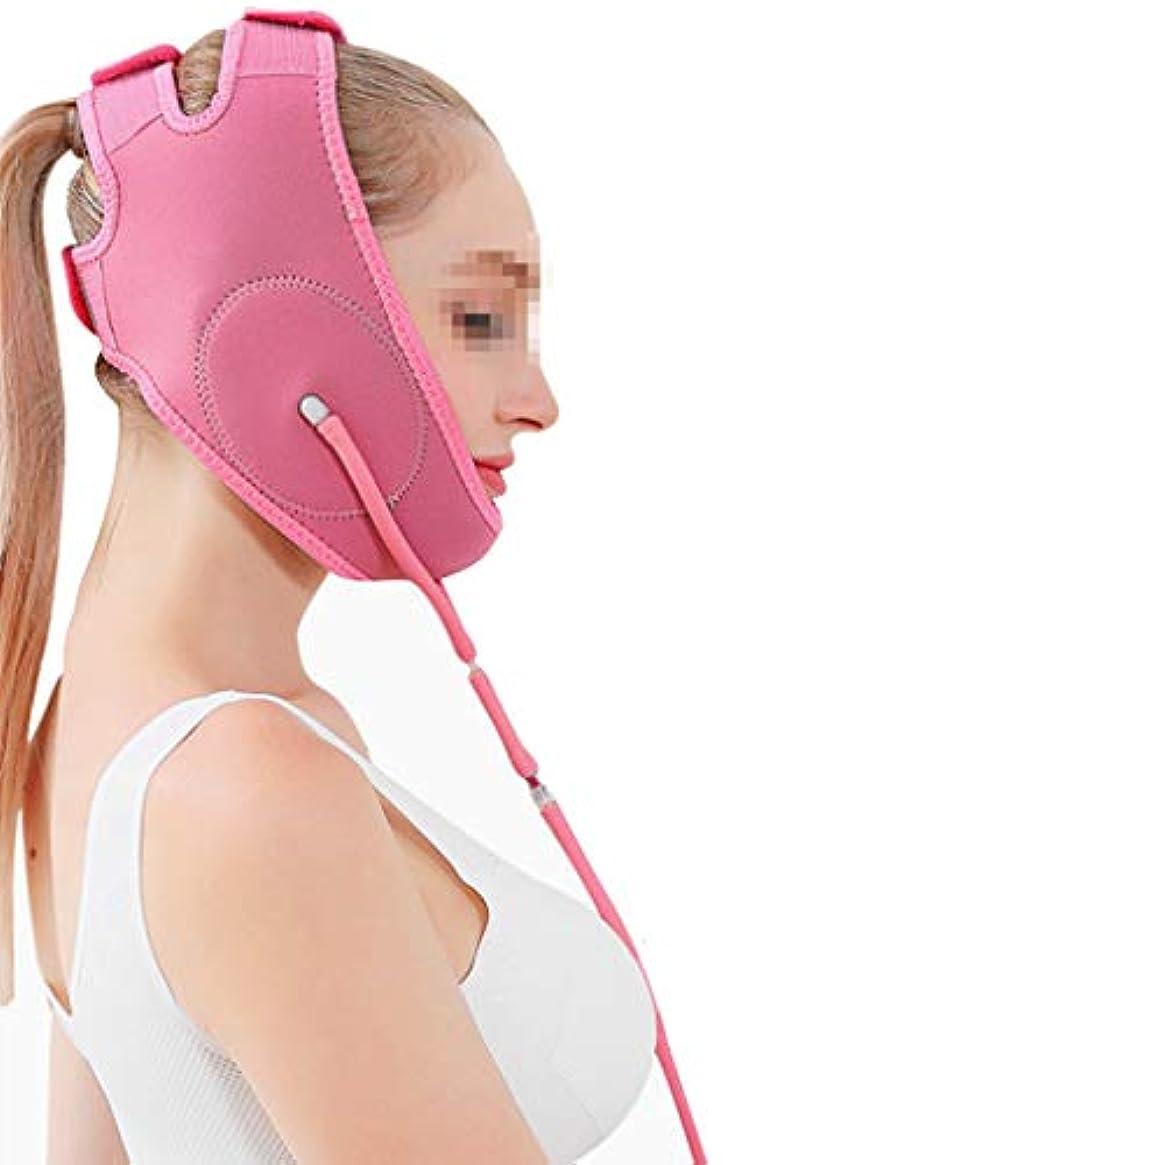 XHLMRMJ 空気圧薄いフェイスベルト、マスク小さなVフェイス圧力リフティングシェーピングかみ傷筋肉引き締めパターン二重あご包帯薄いフェイス包帯マルチカラーオプション (Color : Pink)